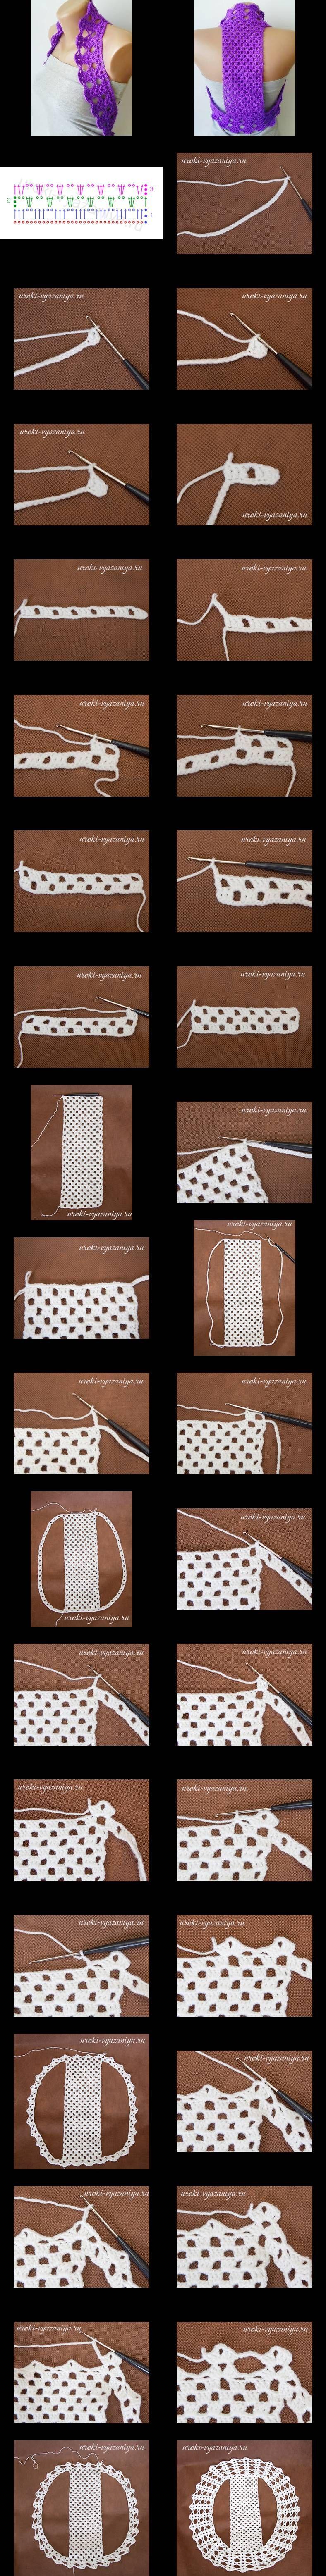 DIY Bolero Crochet DIY Projects | UsefulDIY.com Follow Us on Facebook ==> http://www.facebook.com/UsefulDiy